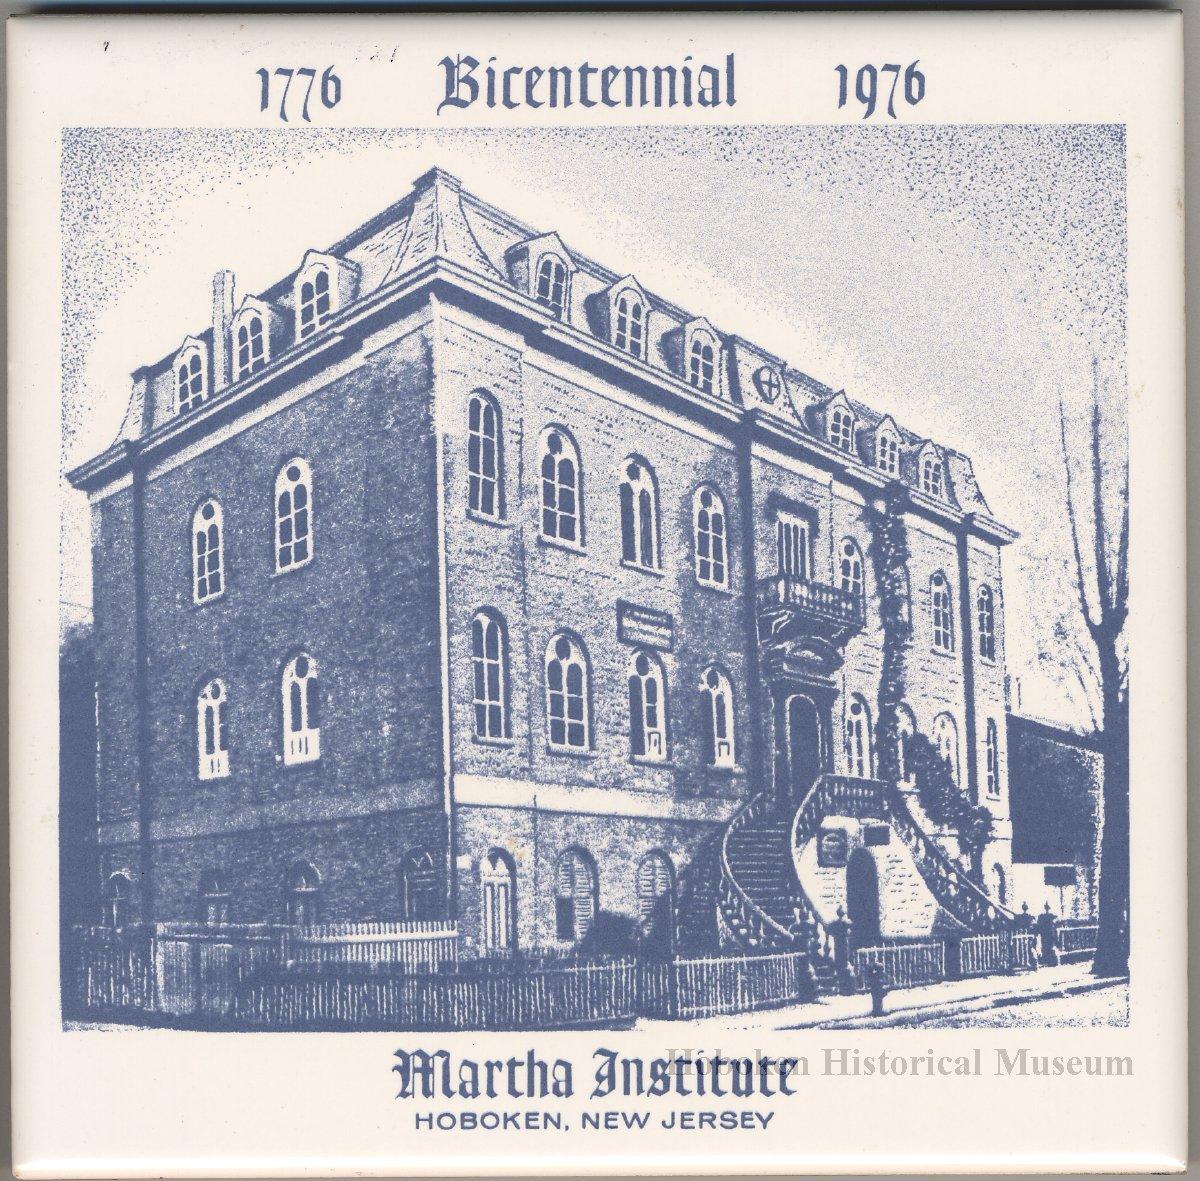 Ceramic Commemorative Tile 1776 1976 Bicentennial Martha Institute